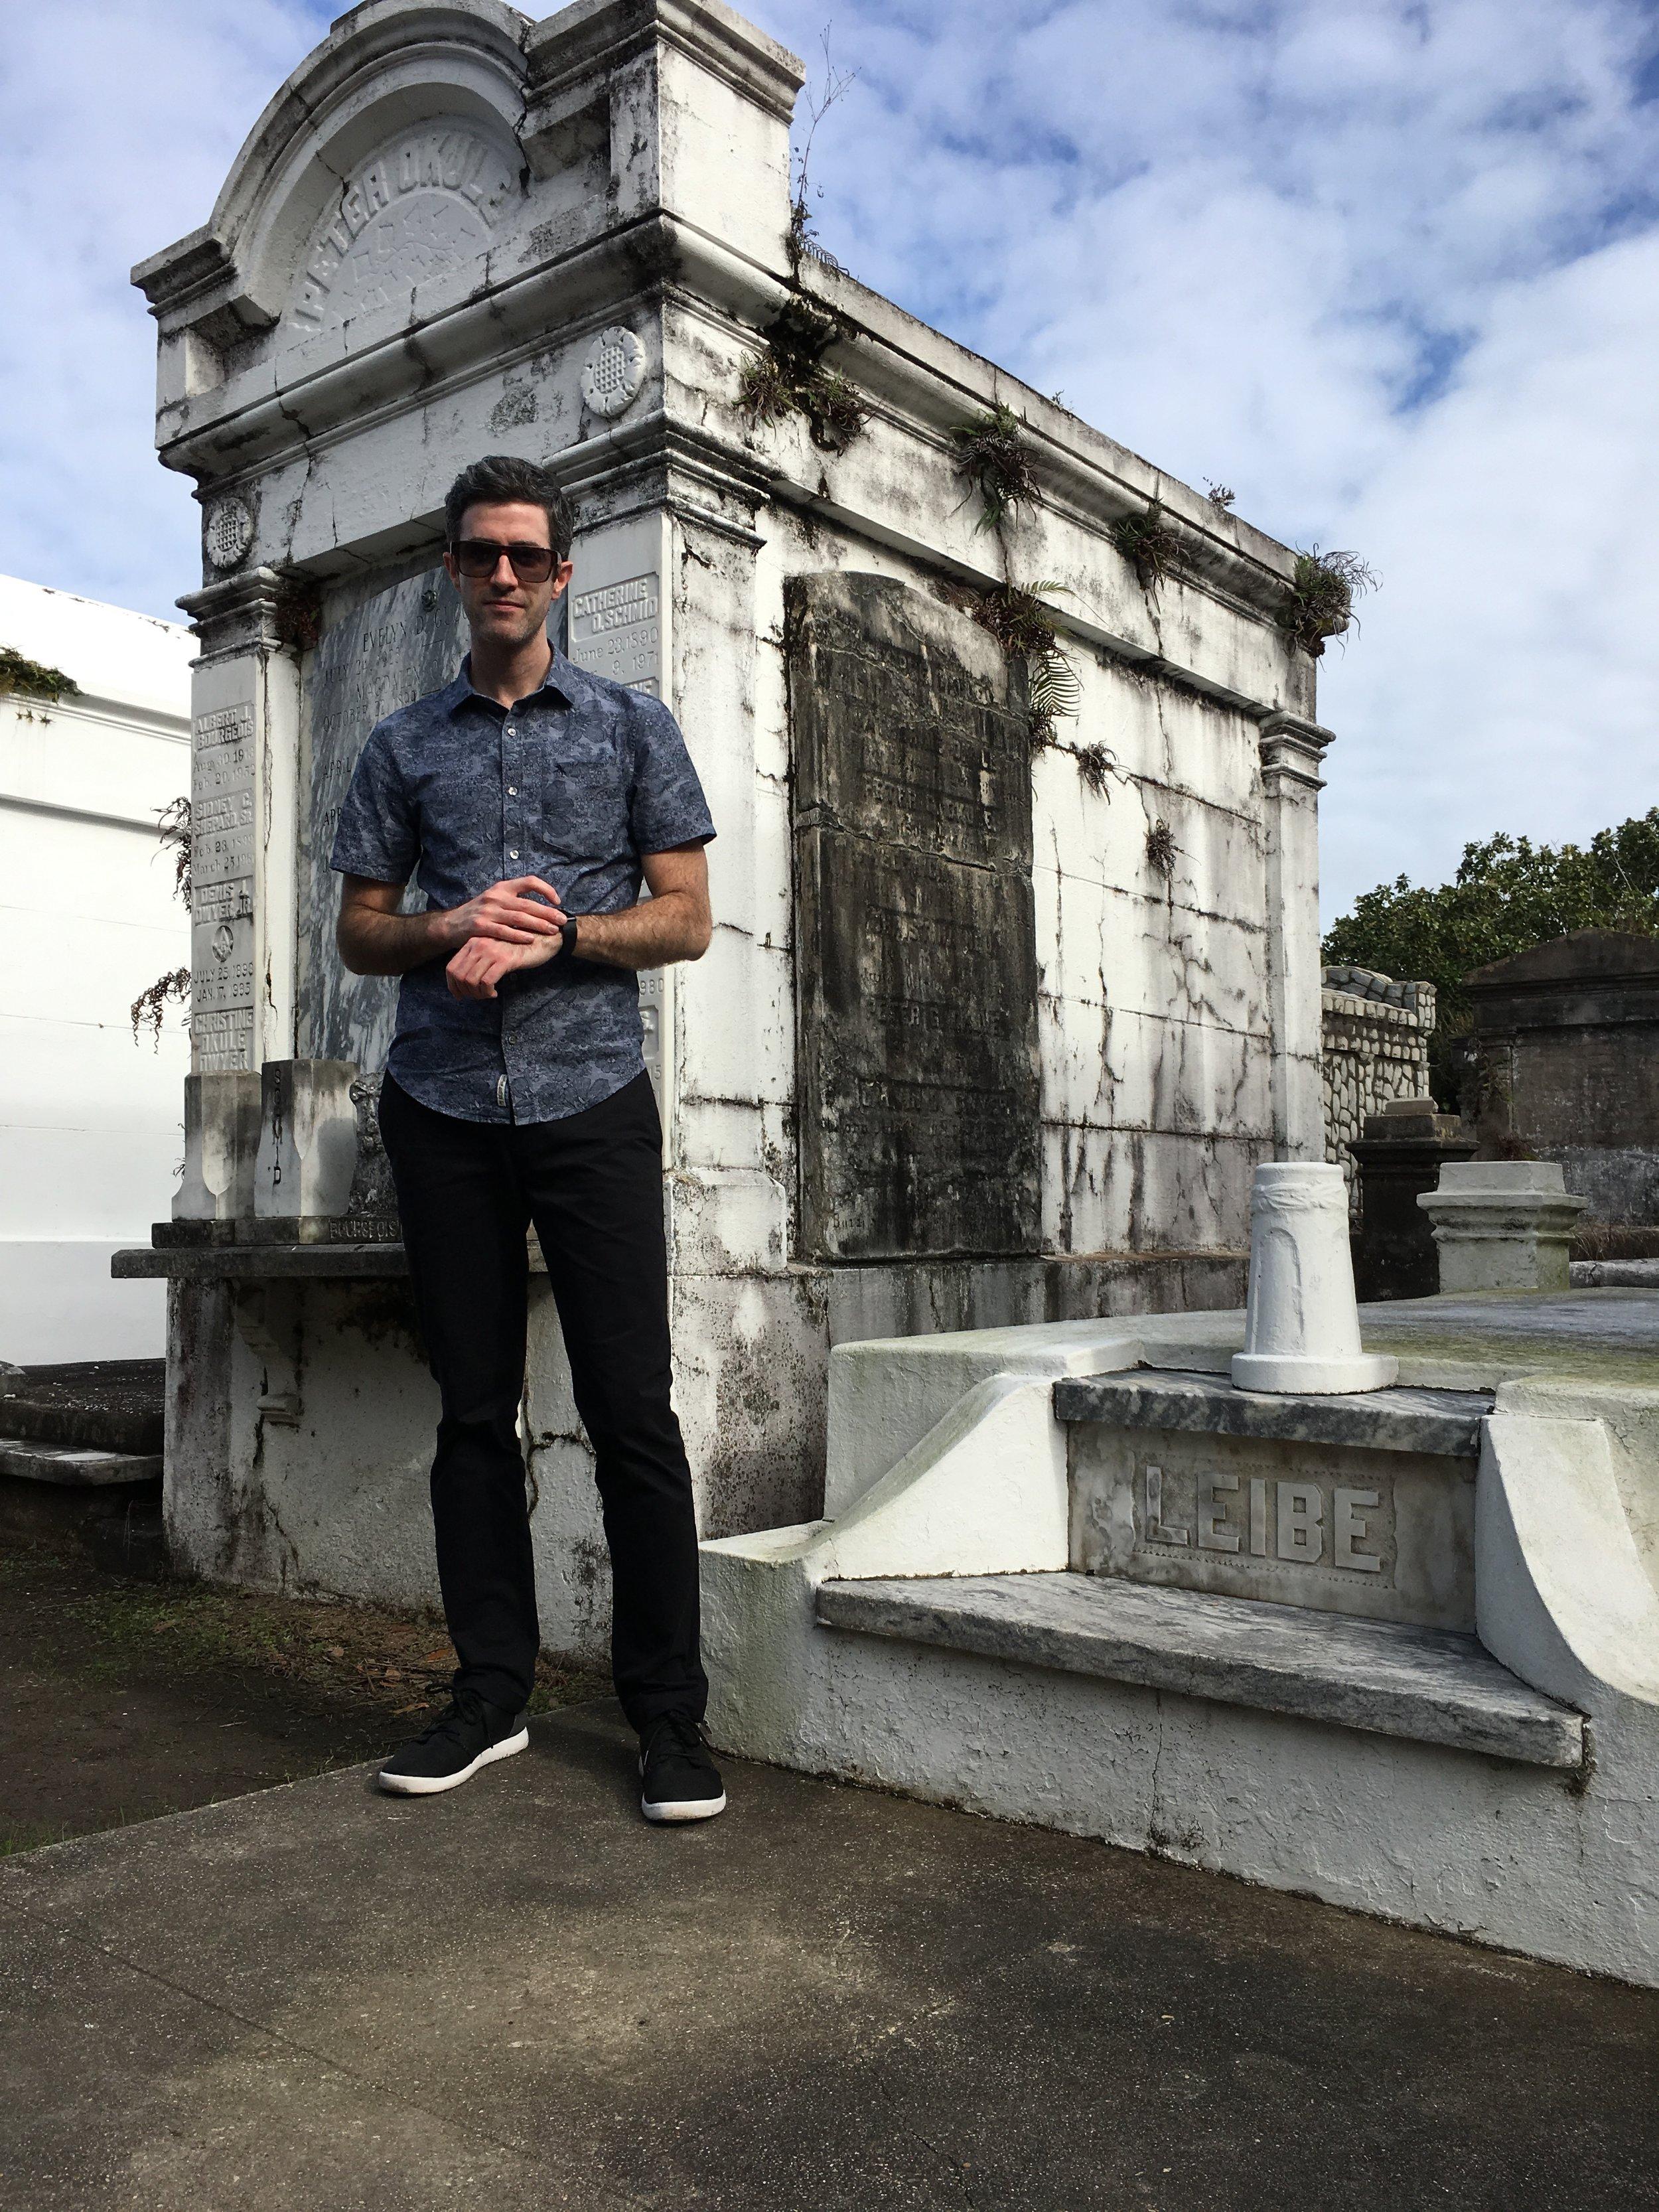 #applewatchselfie: Lafayette Cemetery No. 1